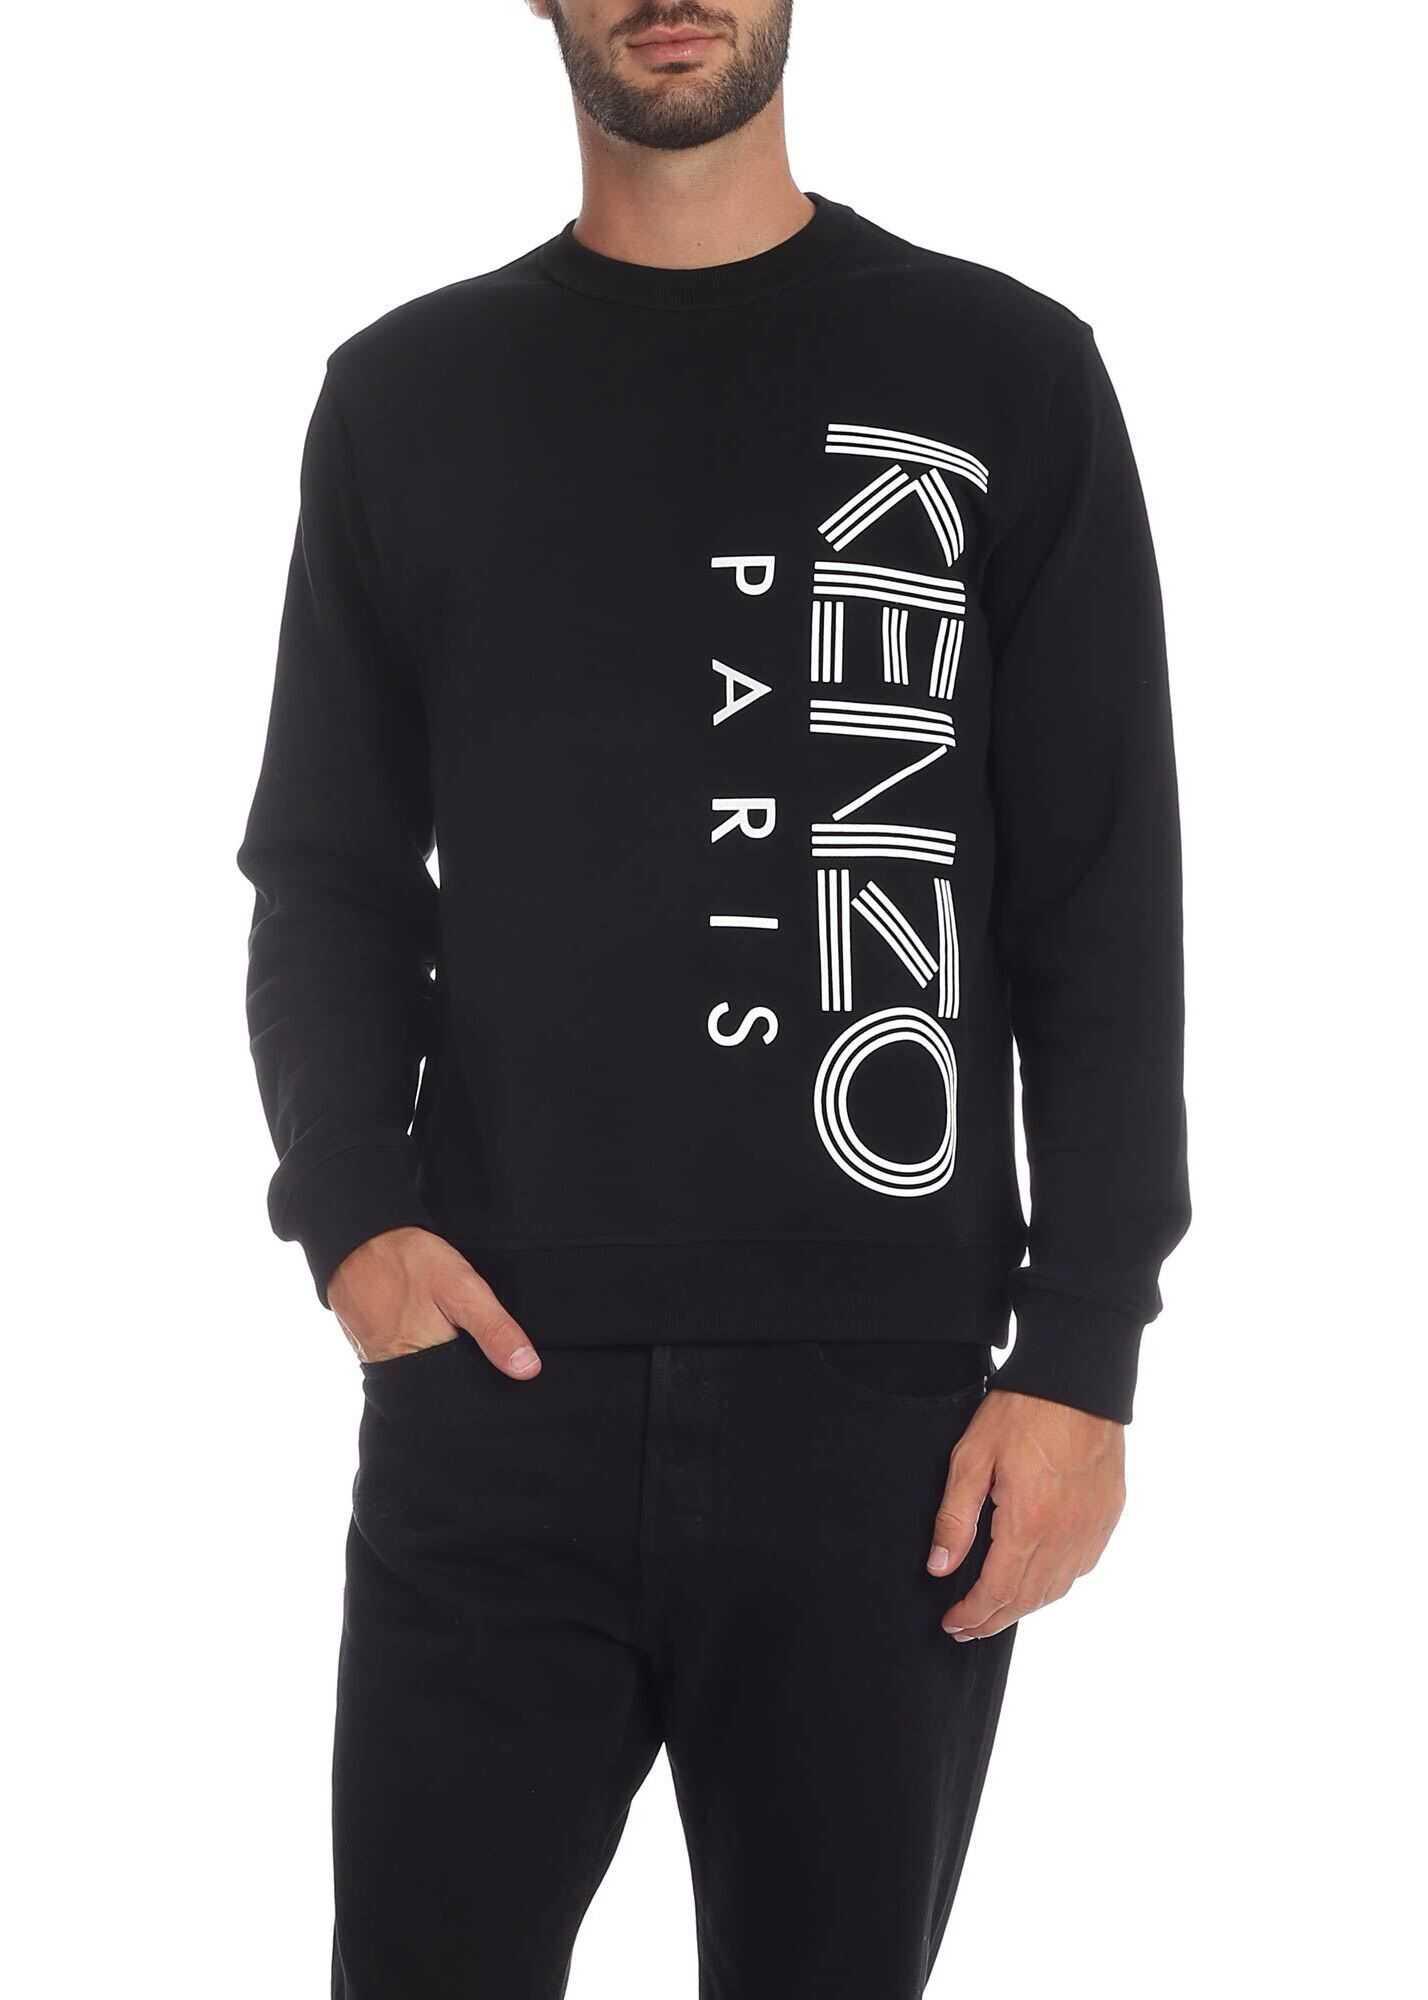 Kenzo Print Sweatshirt In Black thumbnail